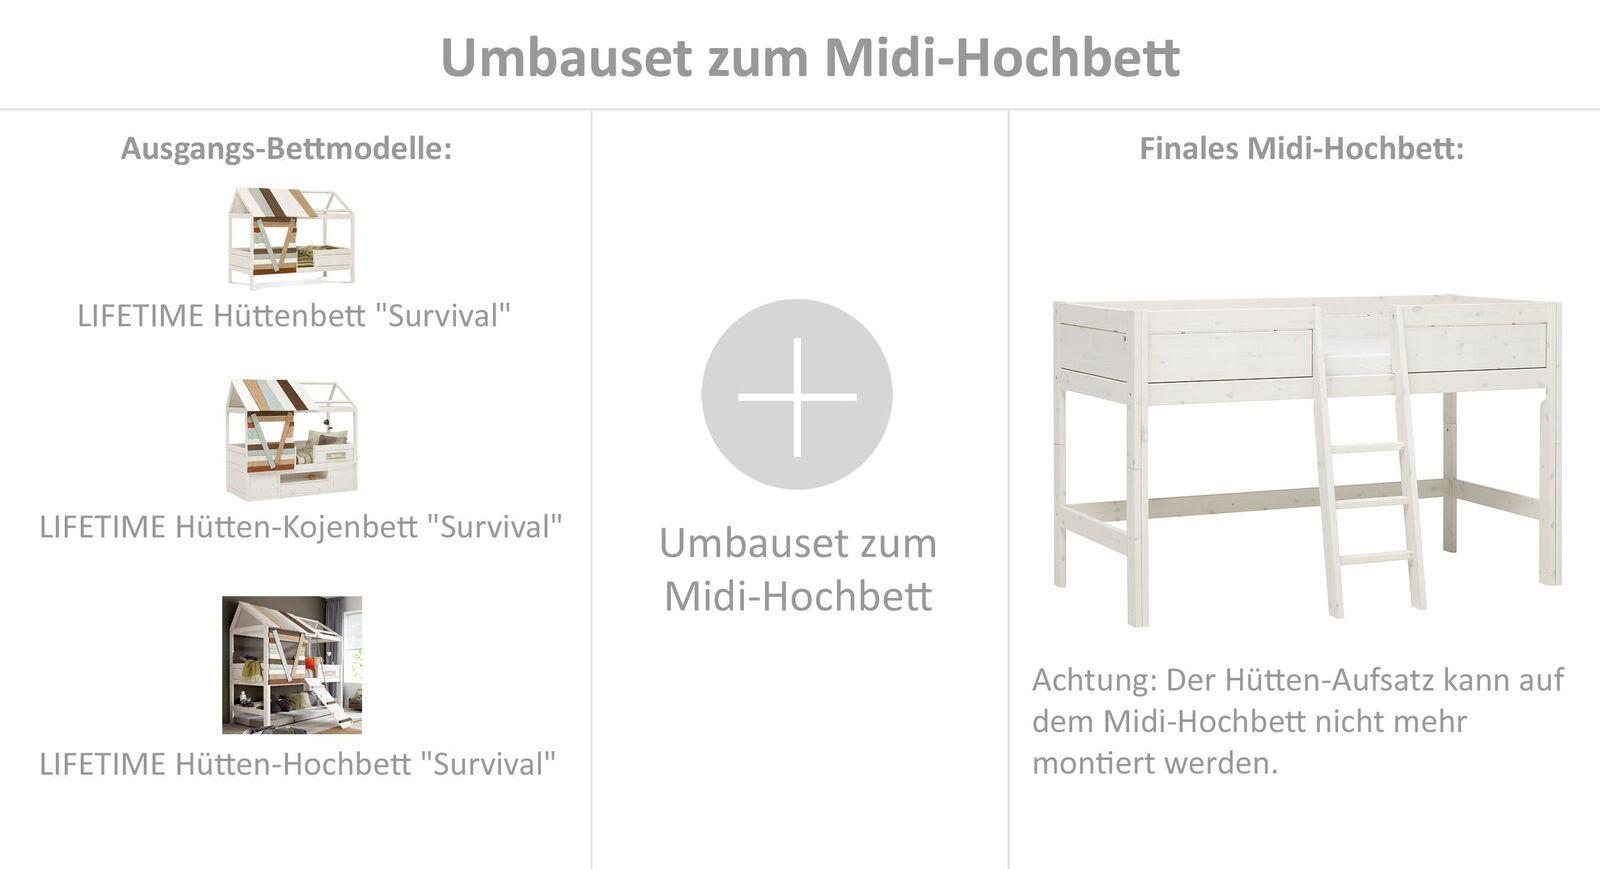 LIFETIME Umbauset zum Mini-Hochbett inklusive Leiter